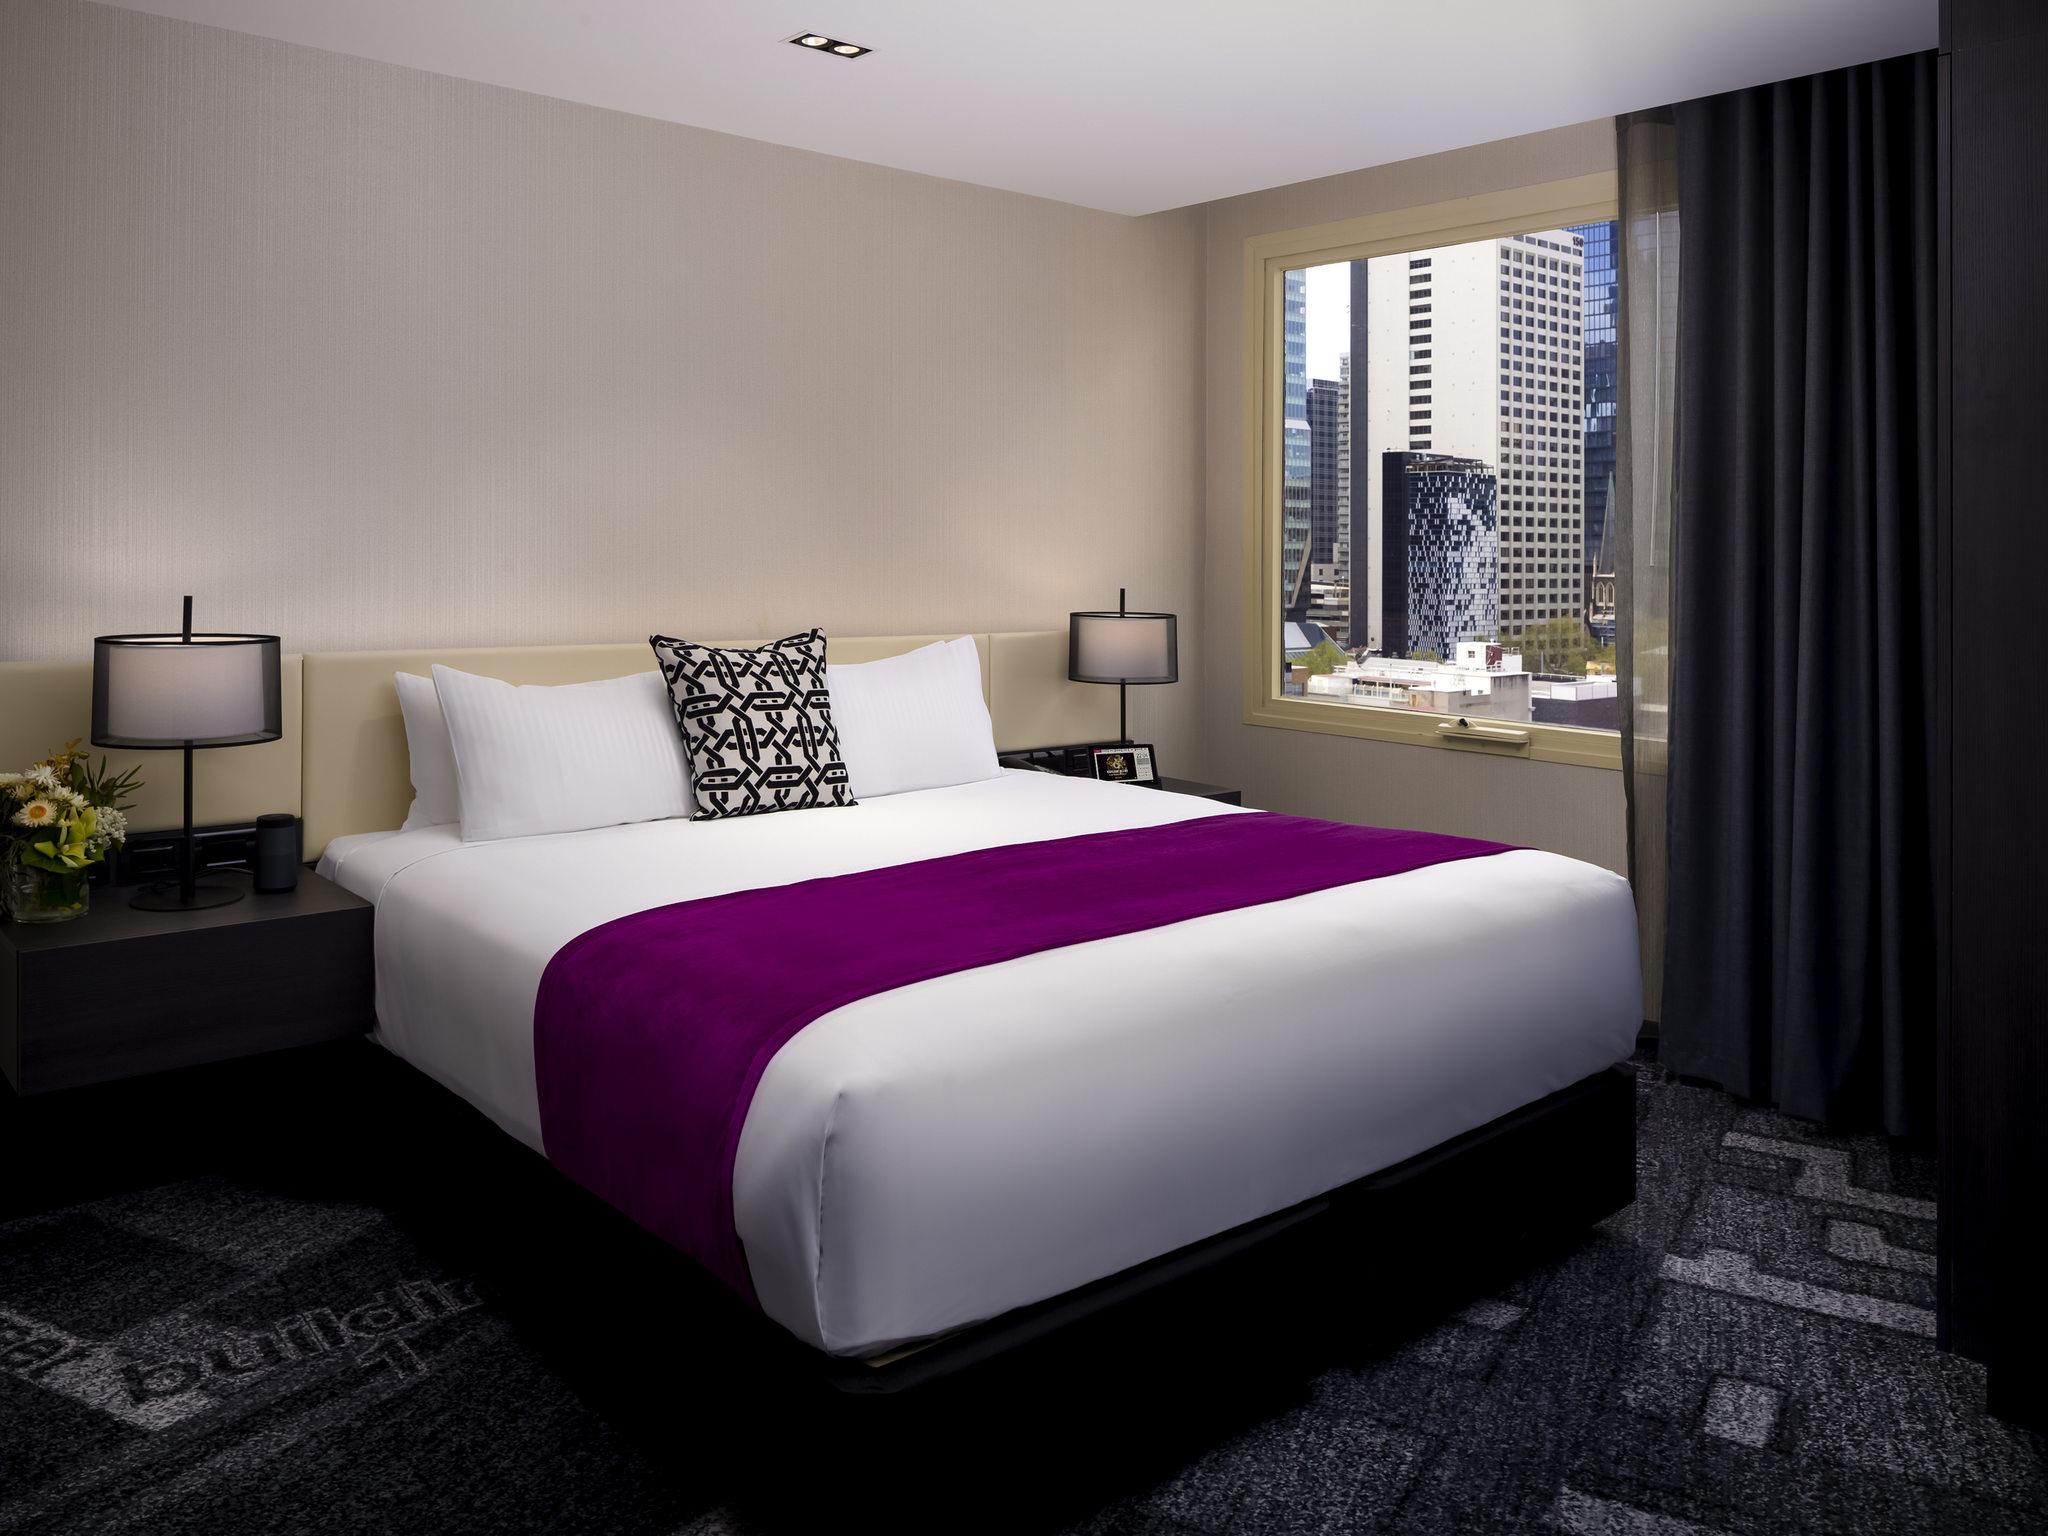 Hotel in MELBOURNE - The Swanston Hotel Melbourne Grand Mercure